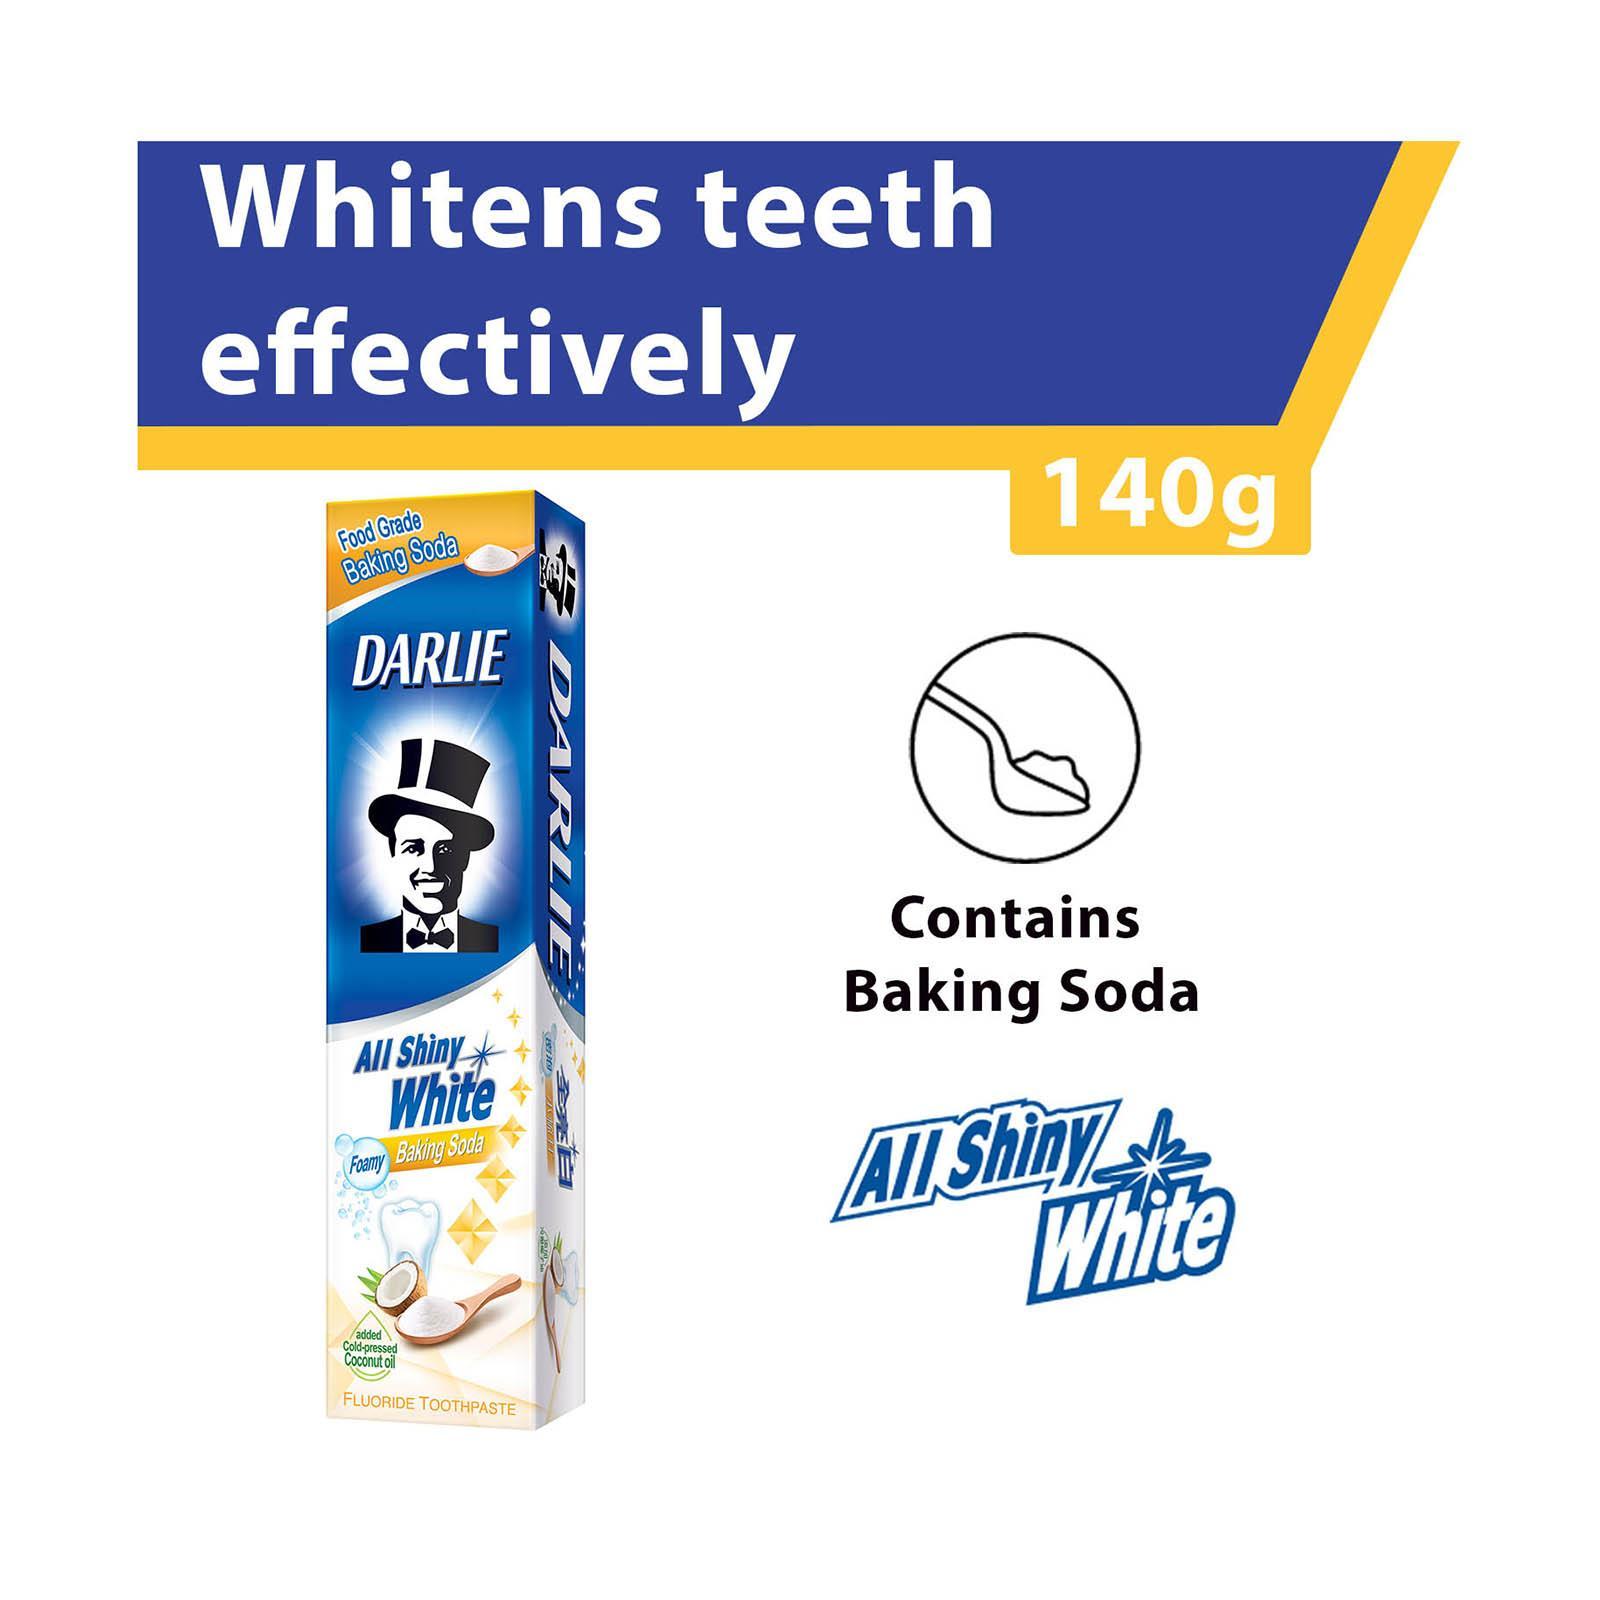 Darlie All Shiny White - Baking Soda Whitening Toothpaste